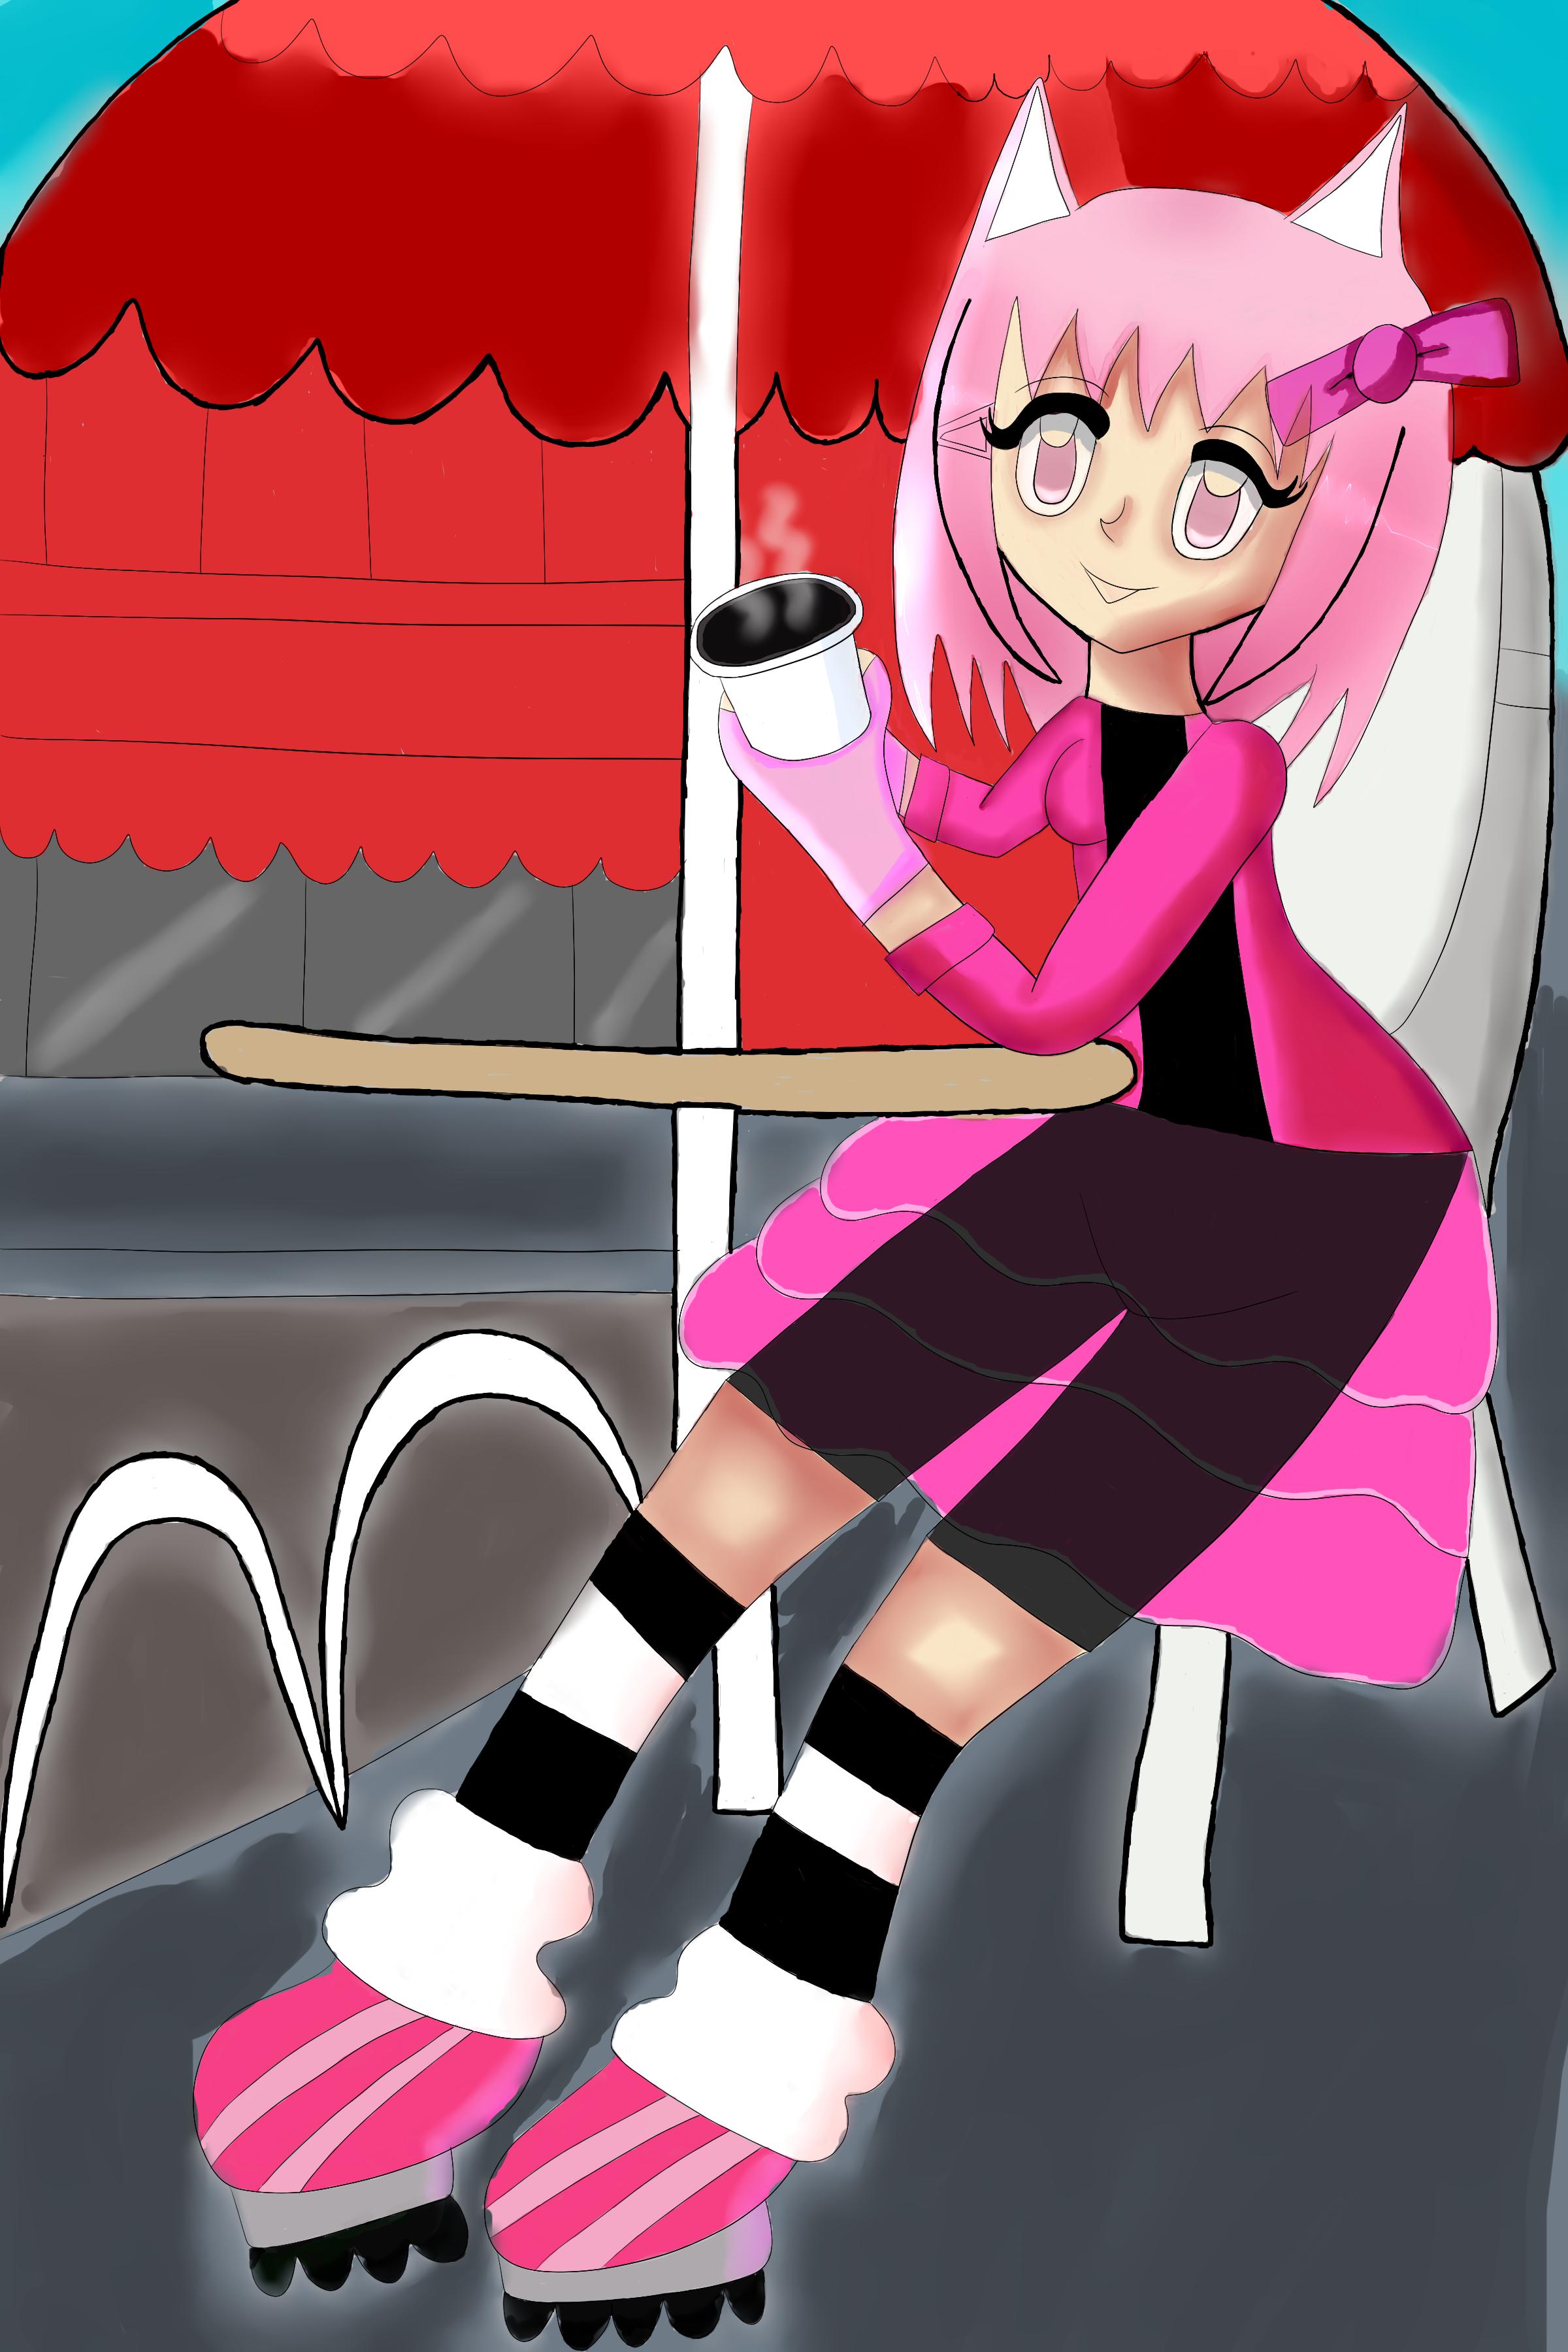 Neko sitting at a cafe